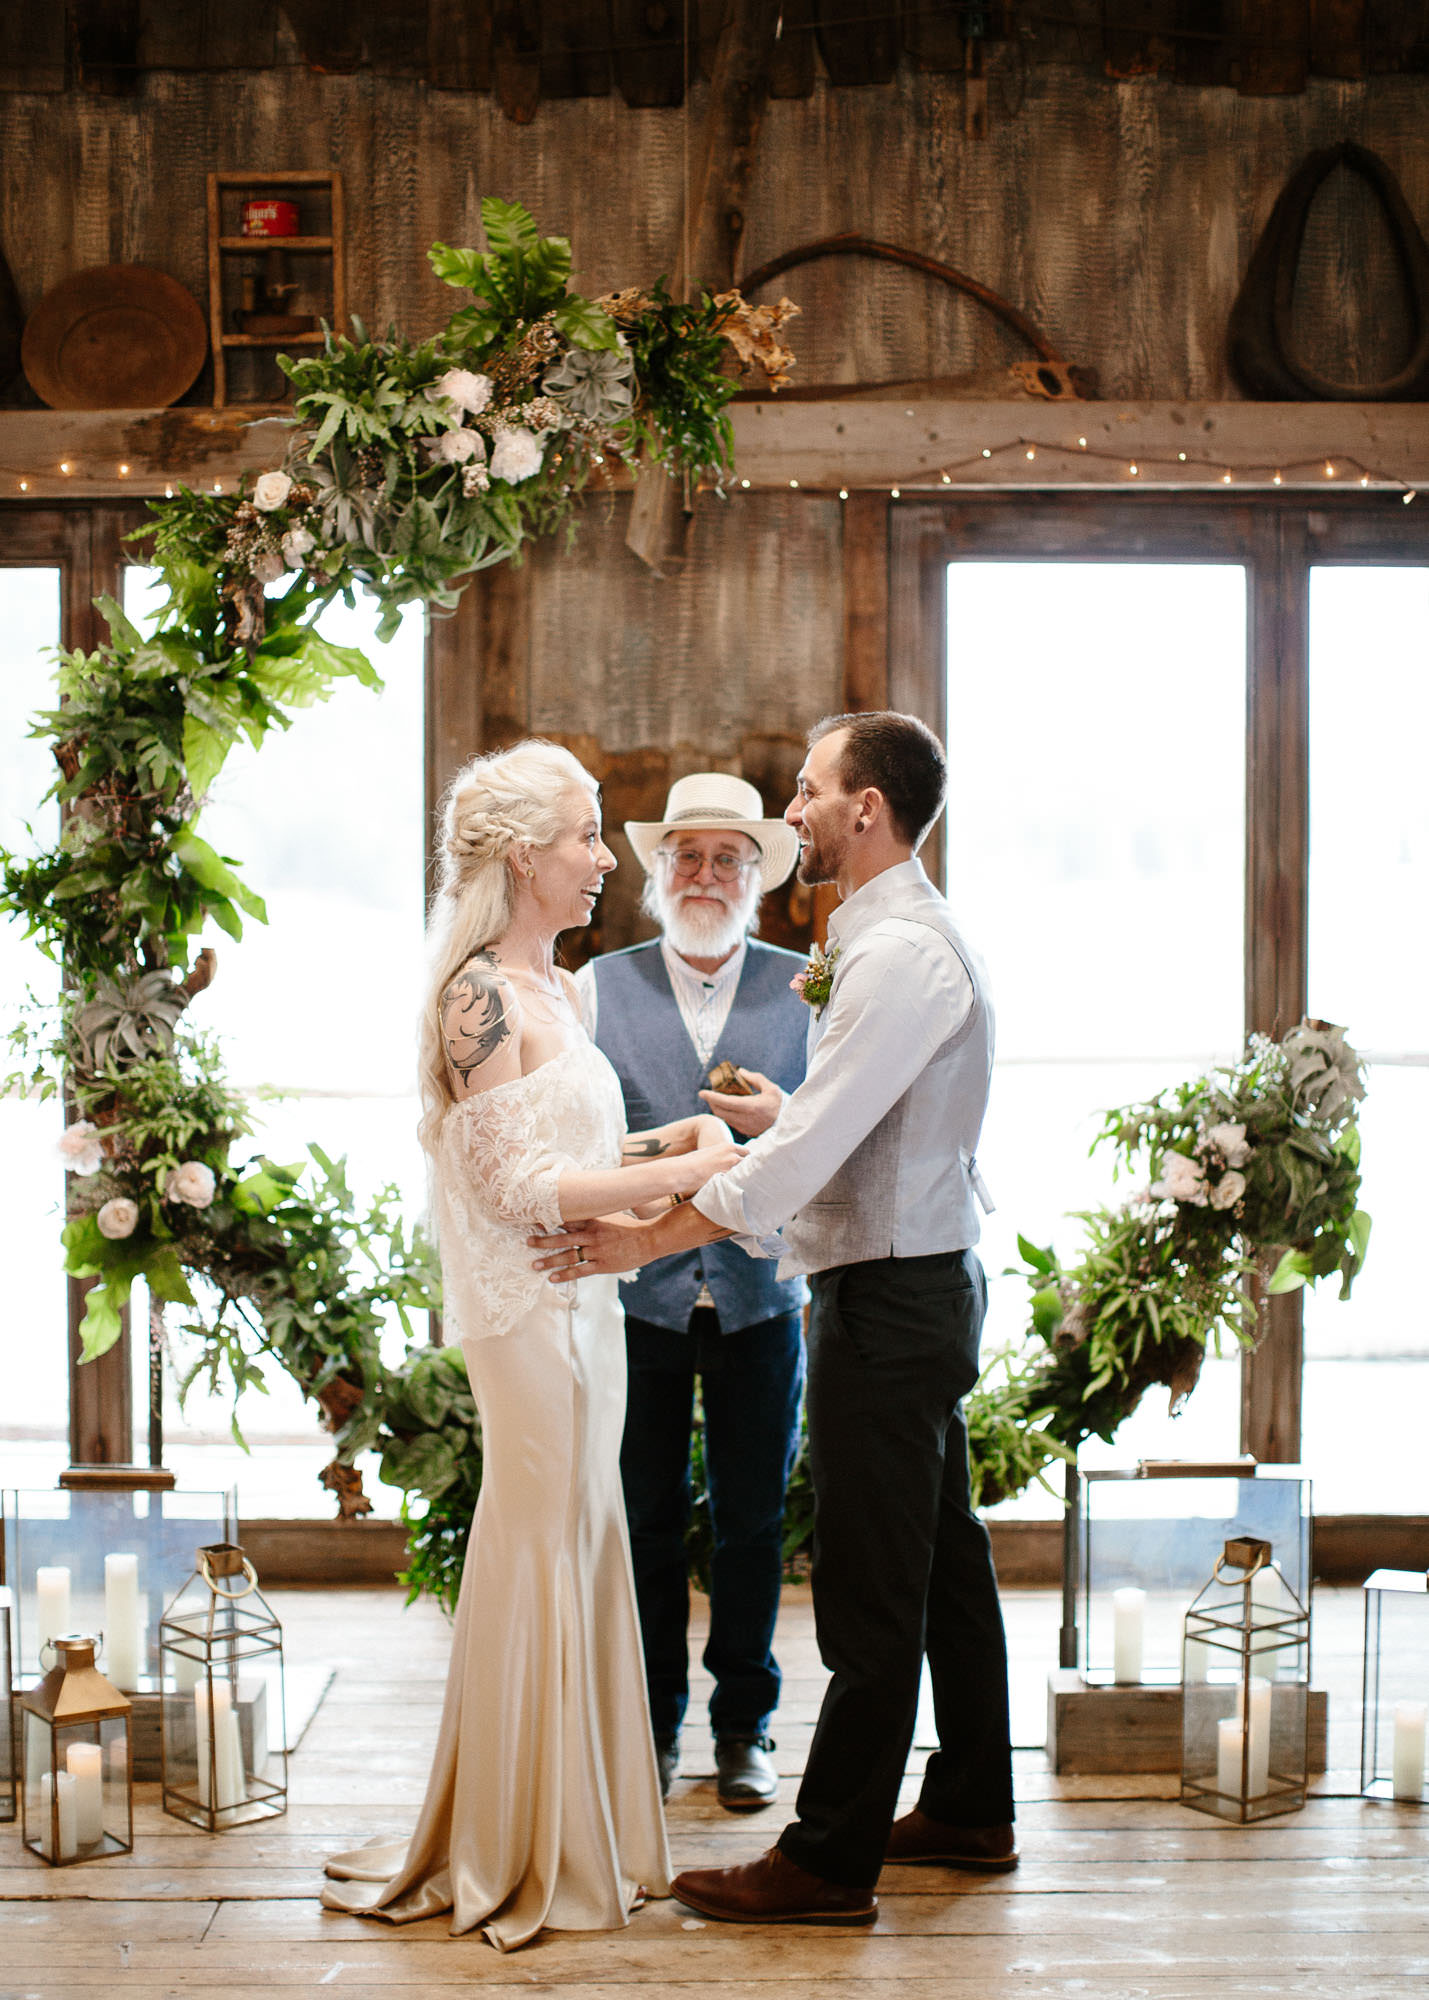 bucci-barn-wedding-elopement-evergreen-boulder-denver-colorado-adventerous-romantic-timeless-065.jpg